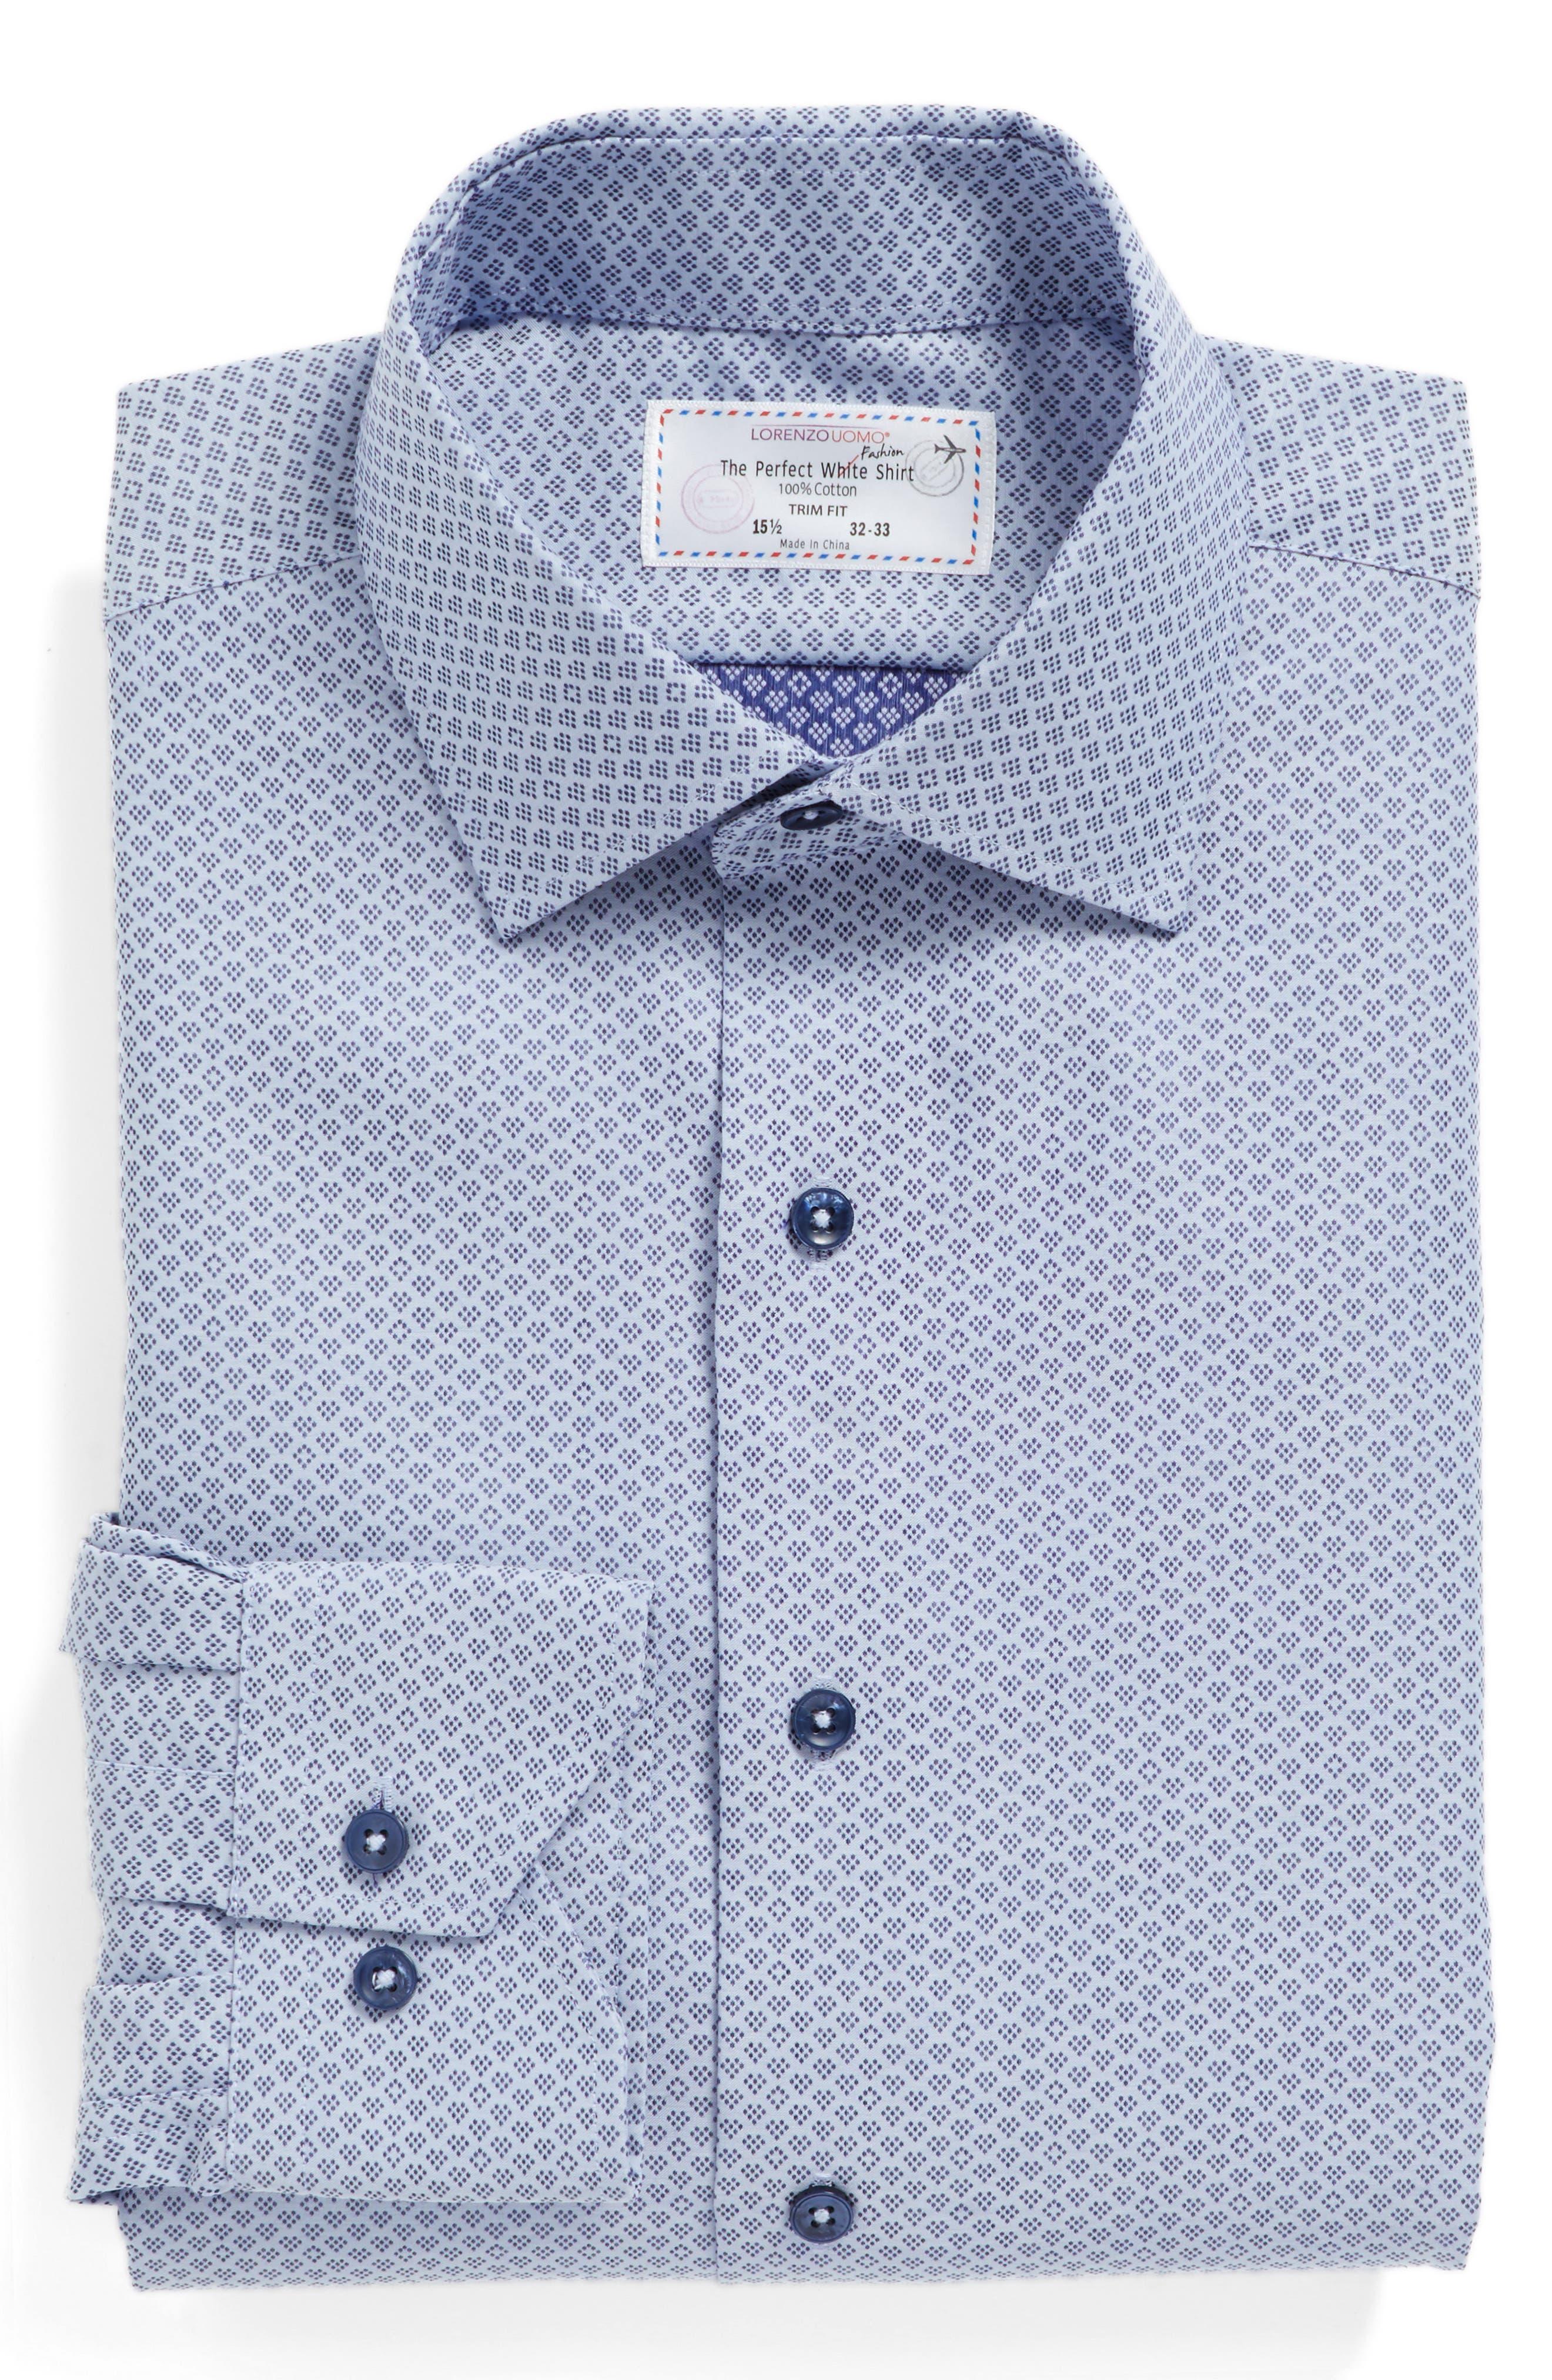 Main Image - Lorenzo Uomo Trim Fit Geometric Dress Shirt